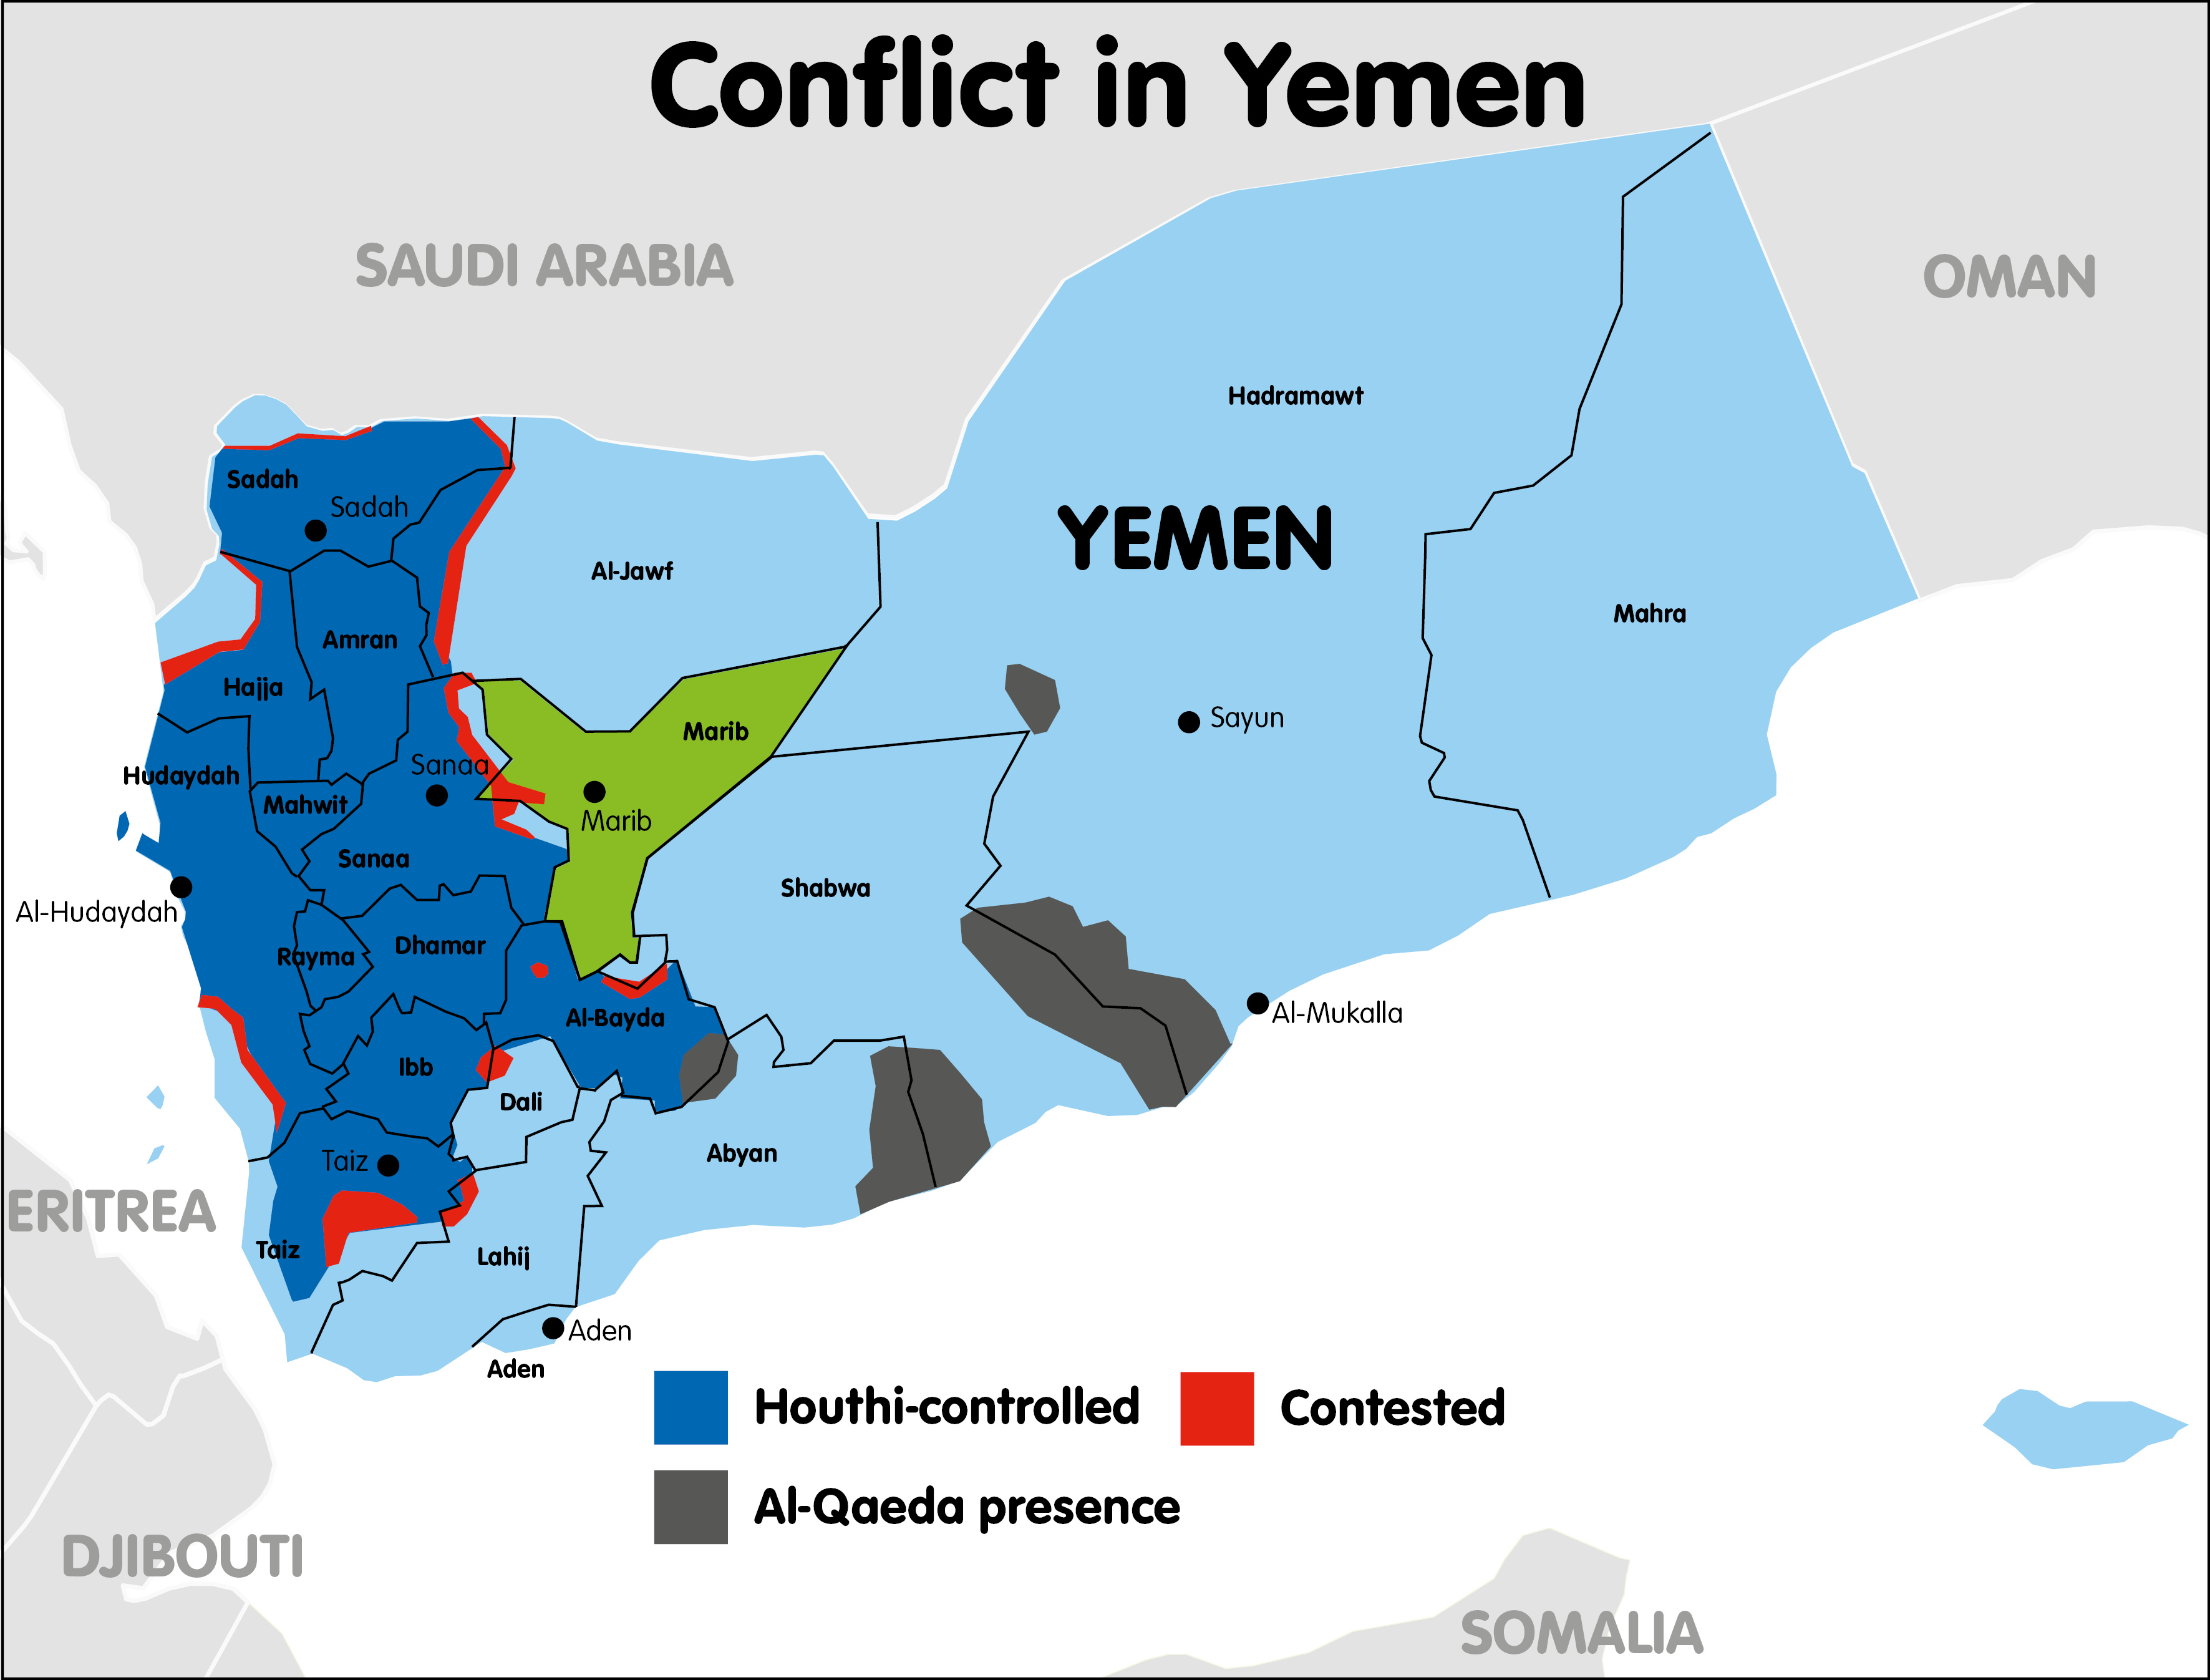 Areas of control in Yemen